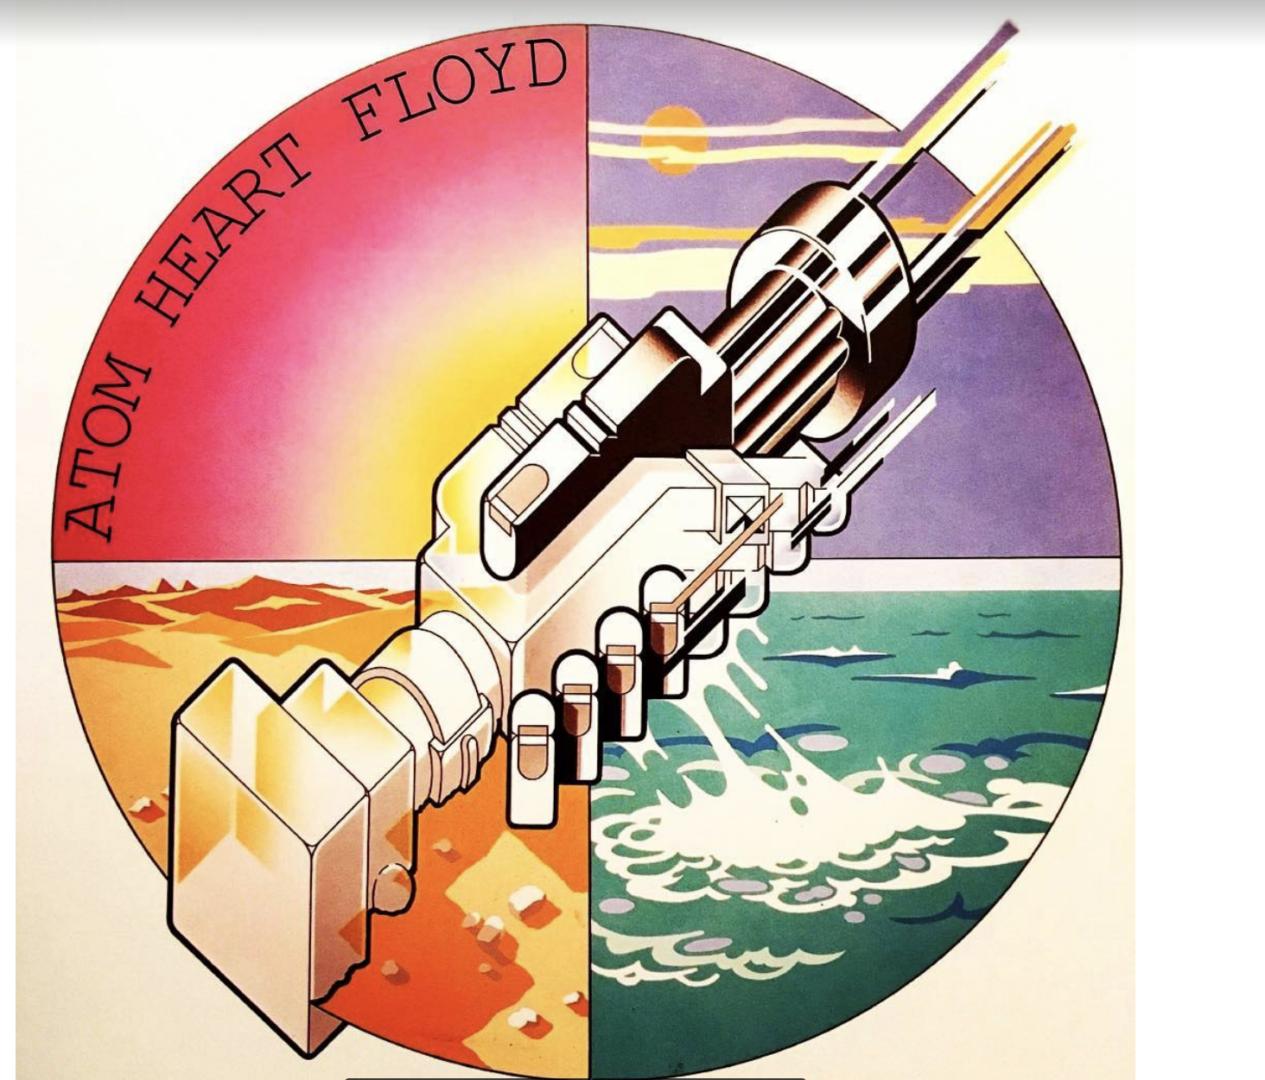 Atom Heart Floyd